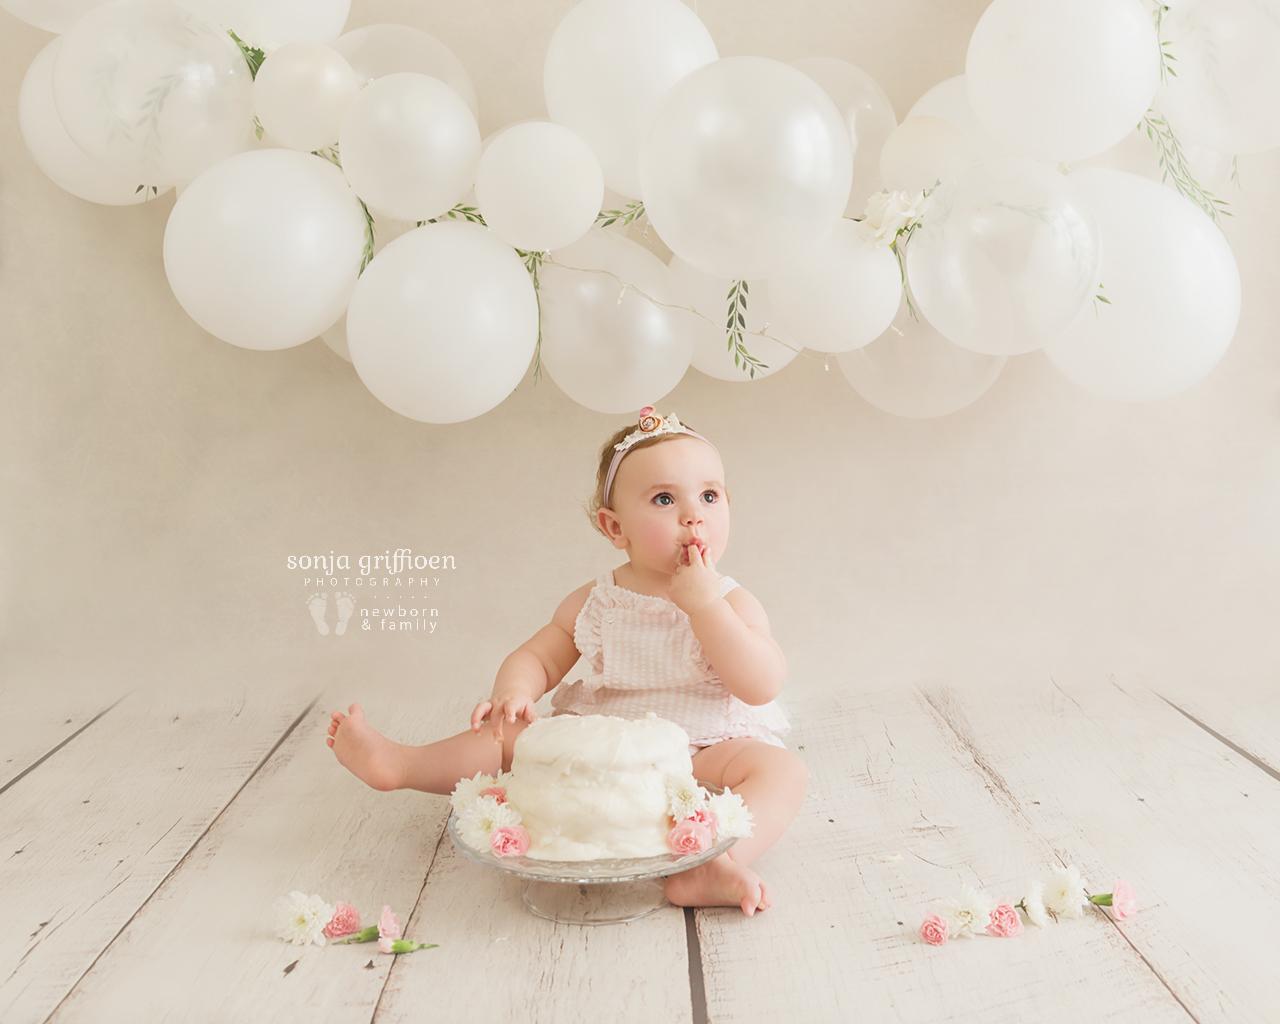 Vivienne-Cake-Smash-Brisbane-Baby-Photographer-Sonja-Griffioen-03.jpg